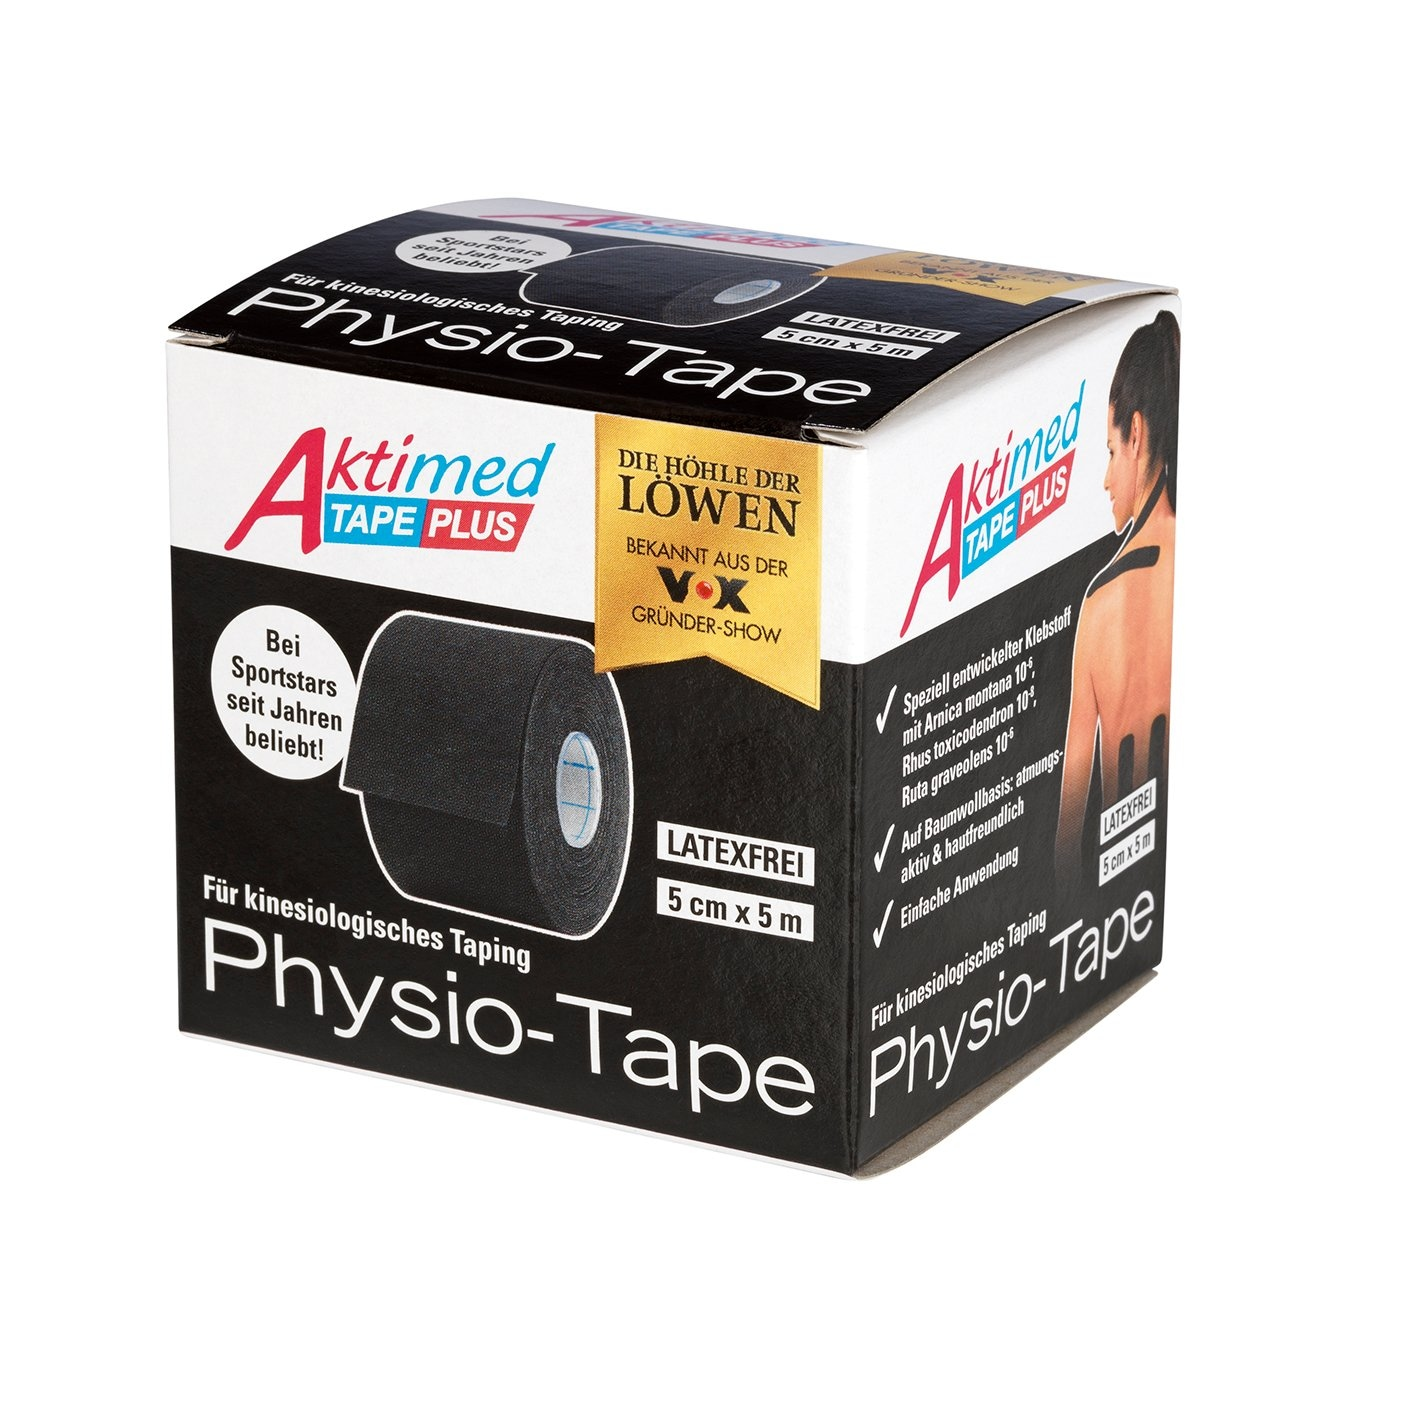 Aktimed Tape Plus 5m schwarz